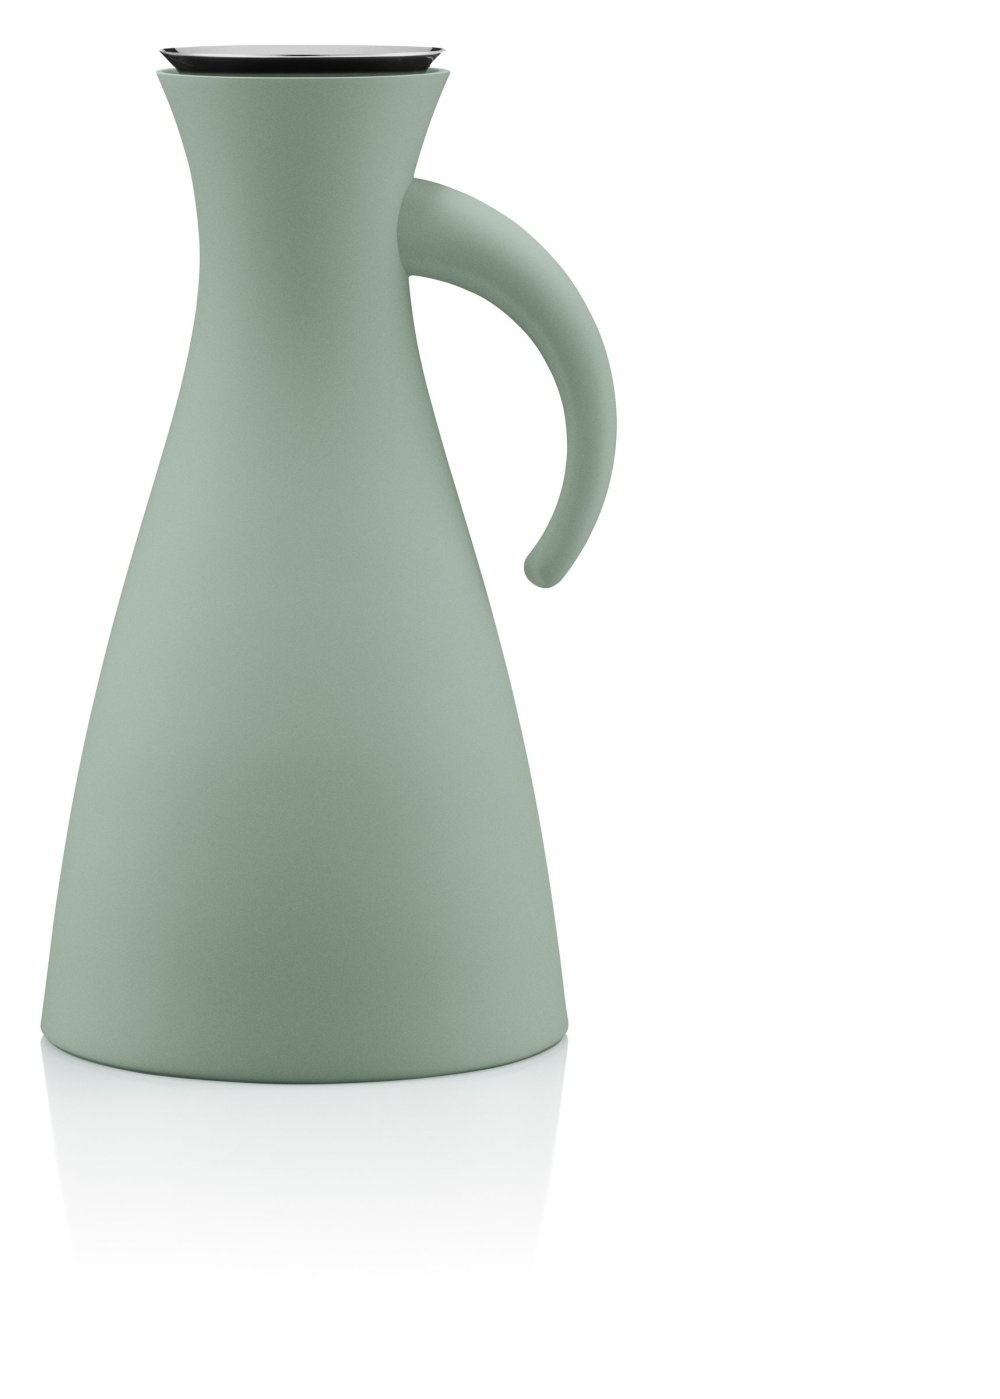 Eva Solo Vacuüm Thermoskan 1 liter